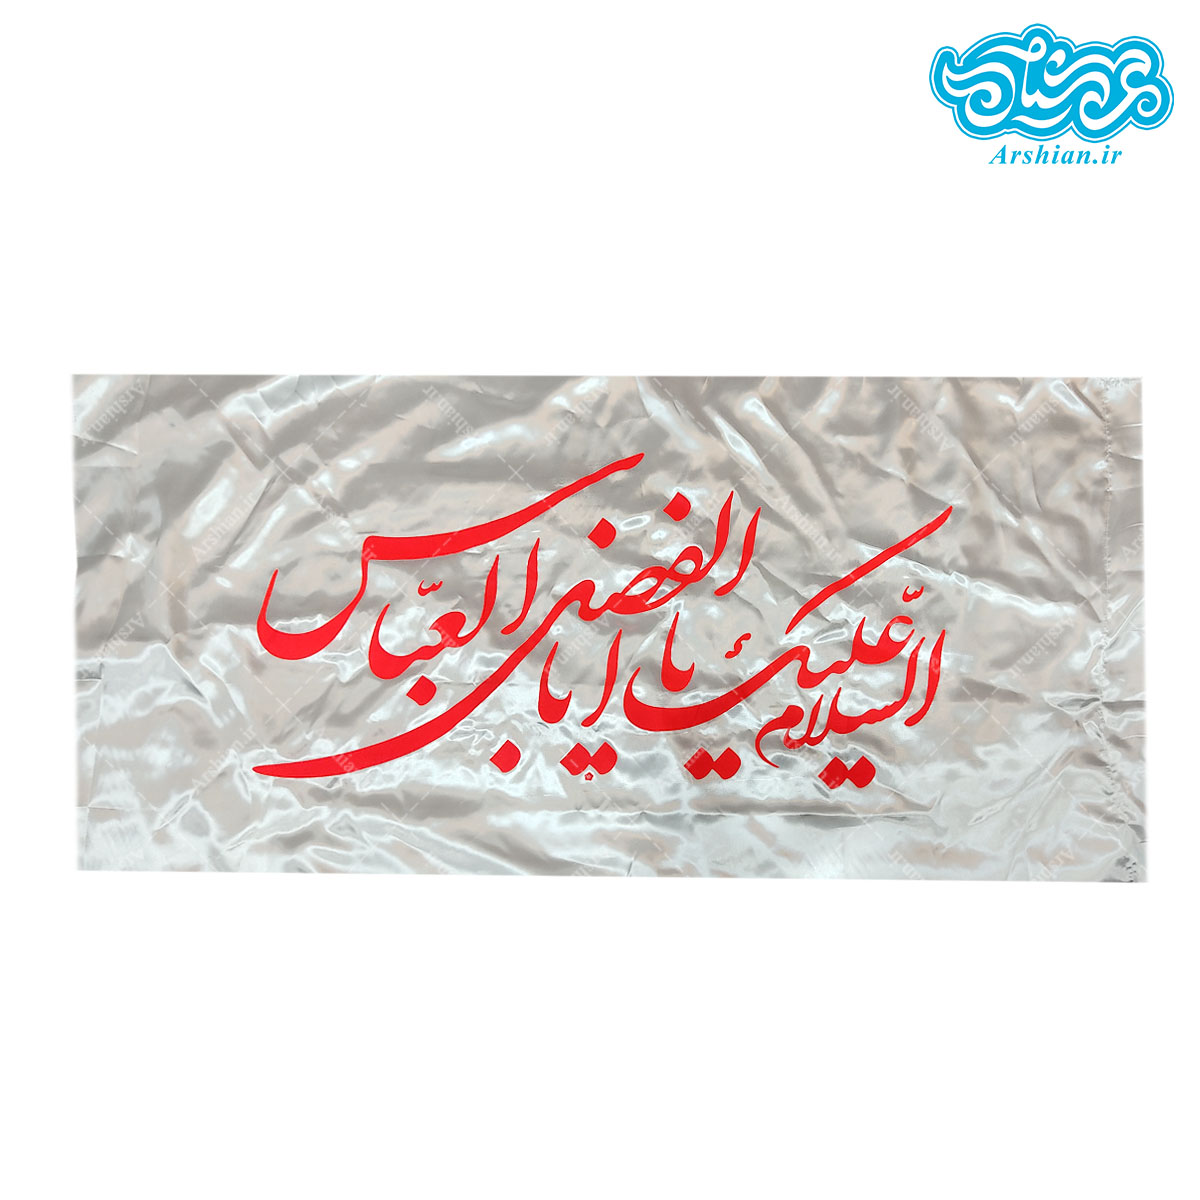 پرچم ساتن السلام علیک یاابالفضل العباس کد022